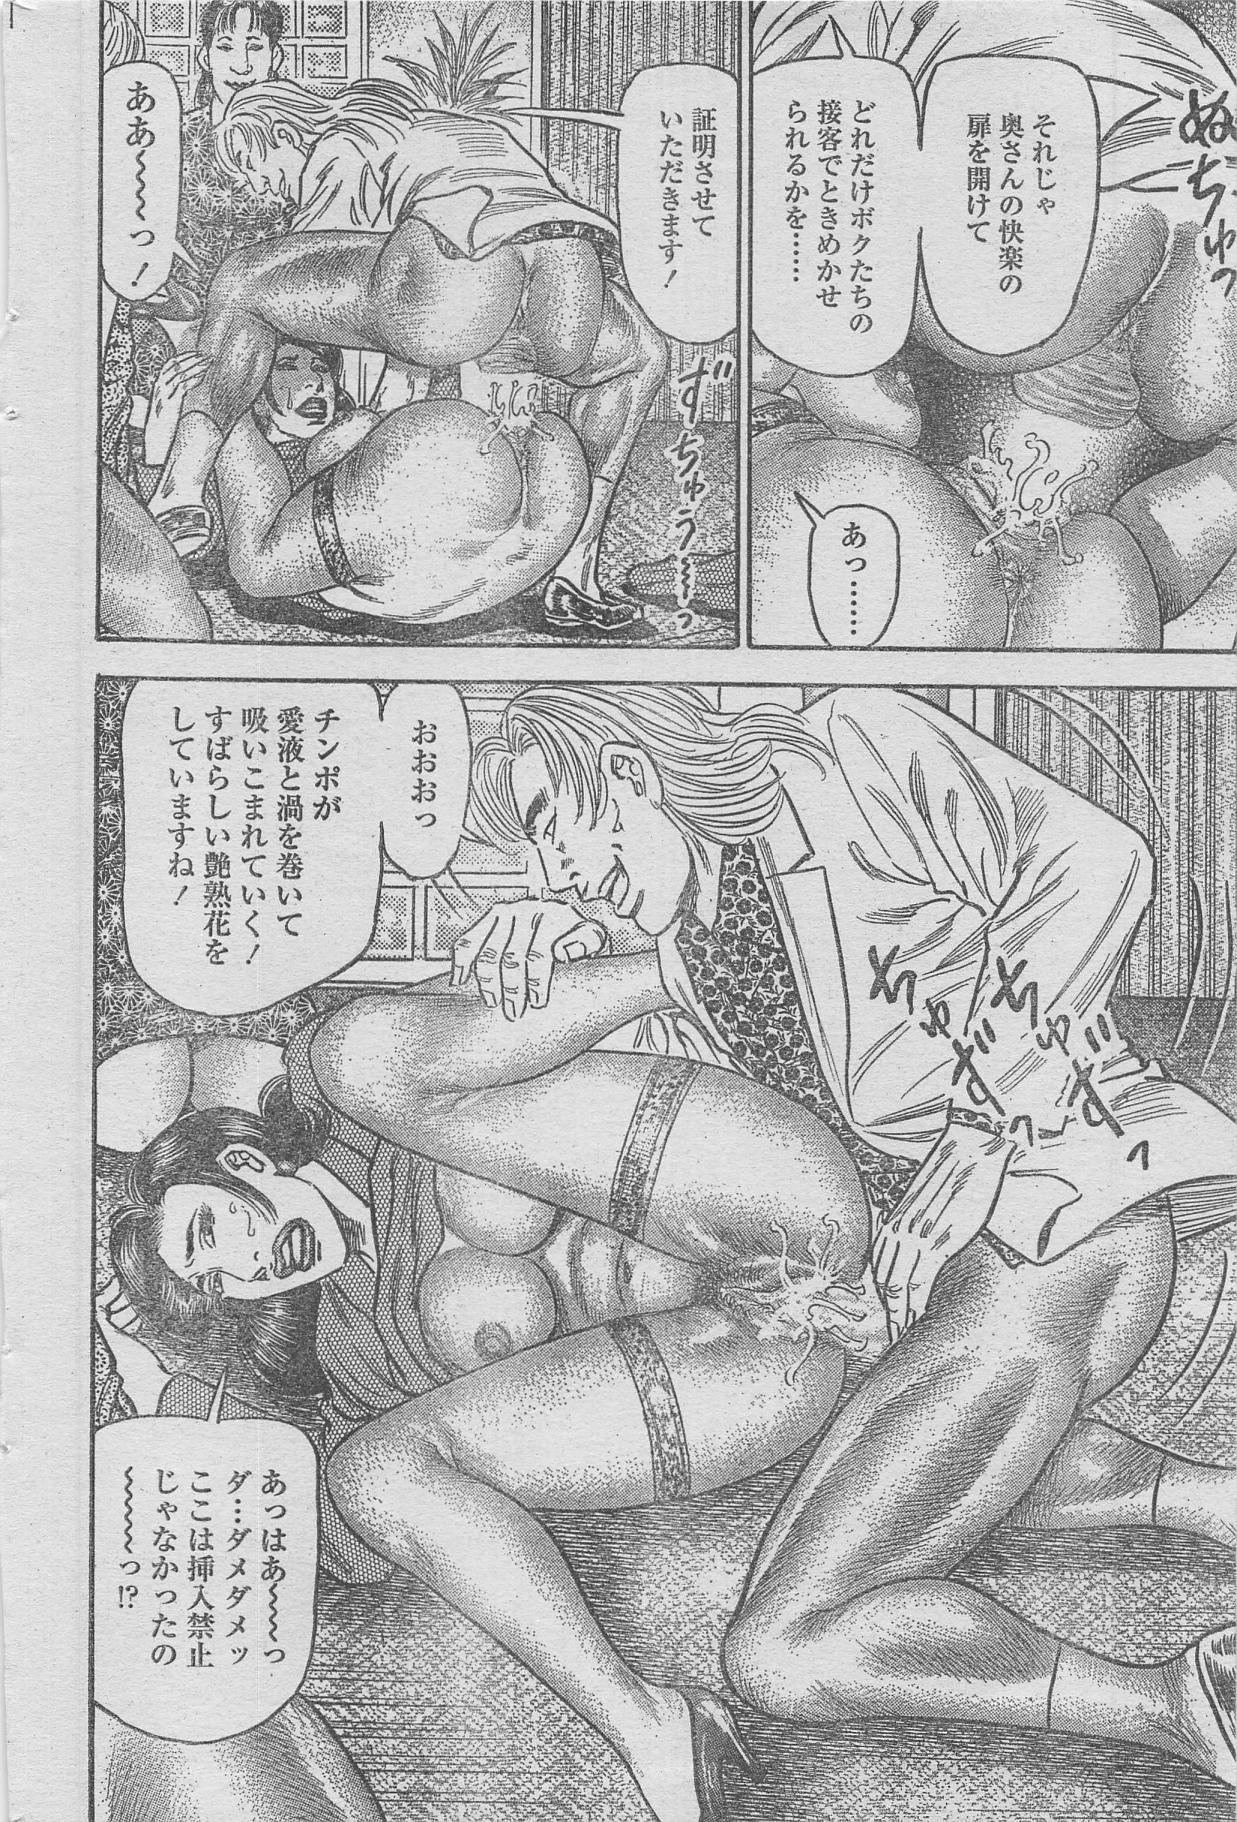 Manga Lawrence 2013-04 59